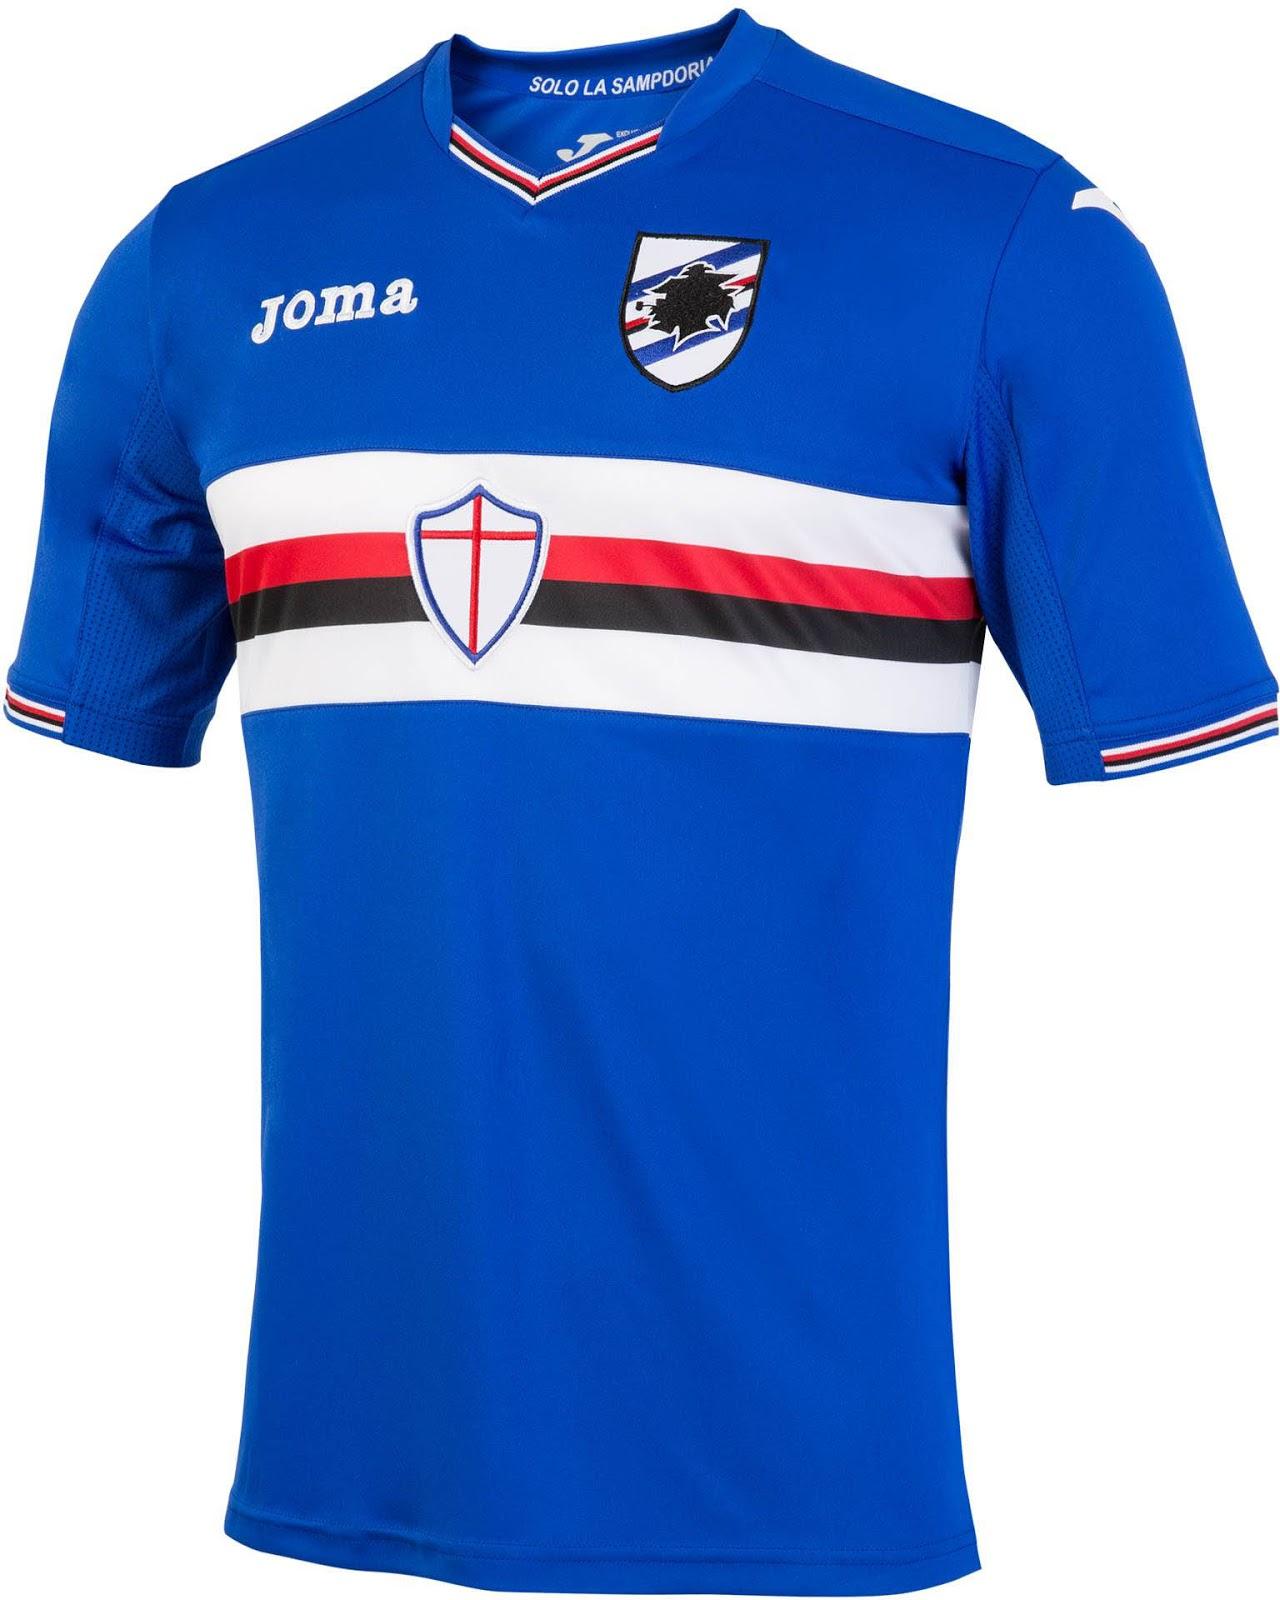 sampdoria-16-17-kits-home-font